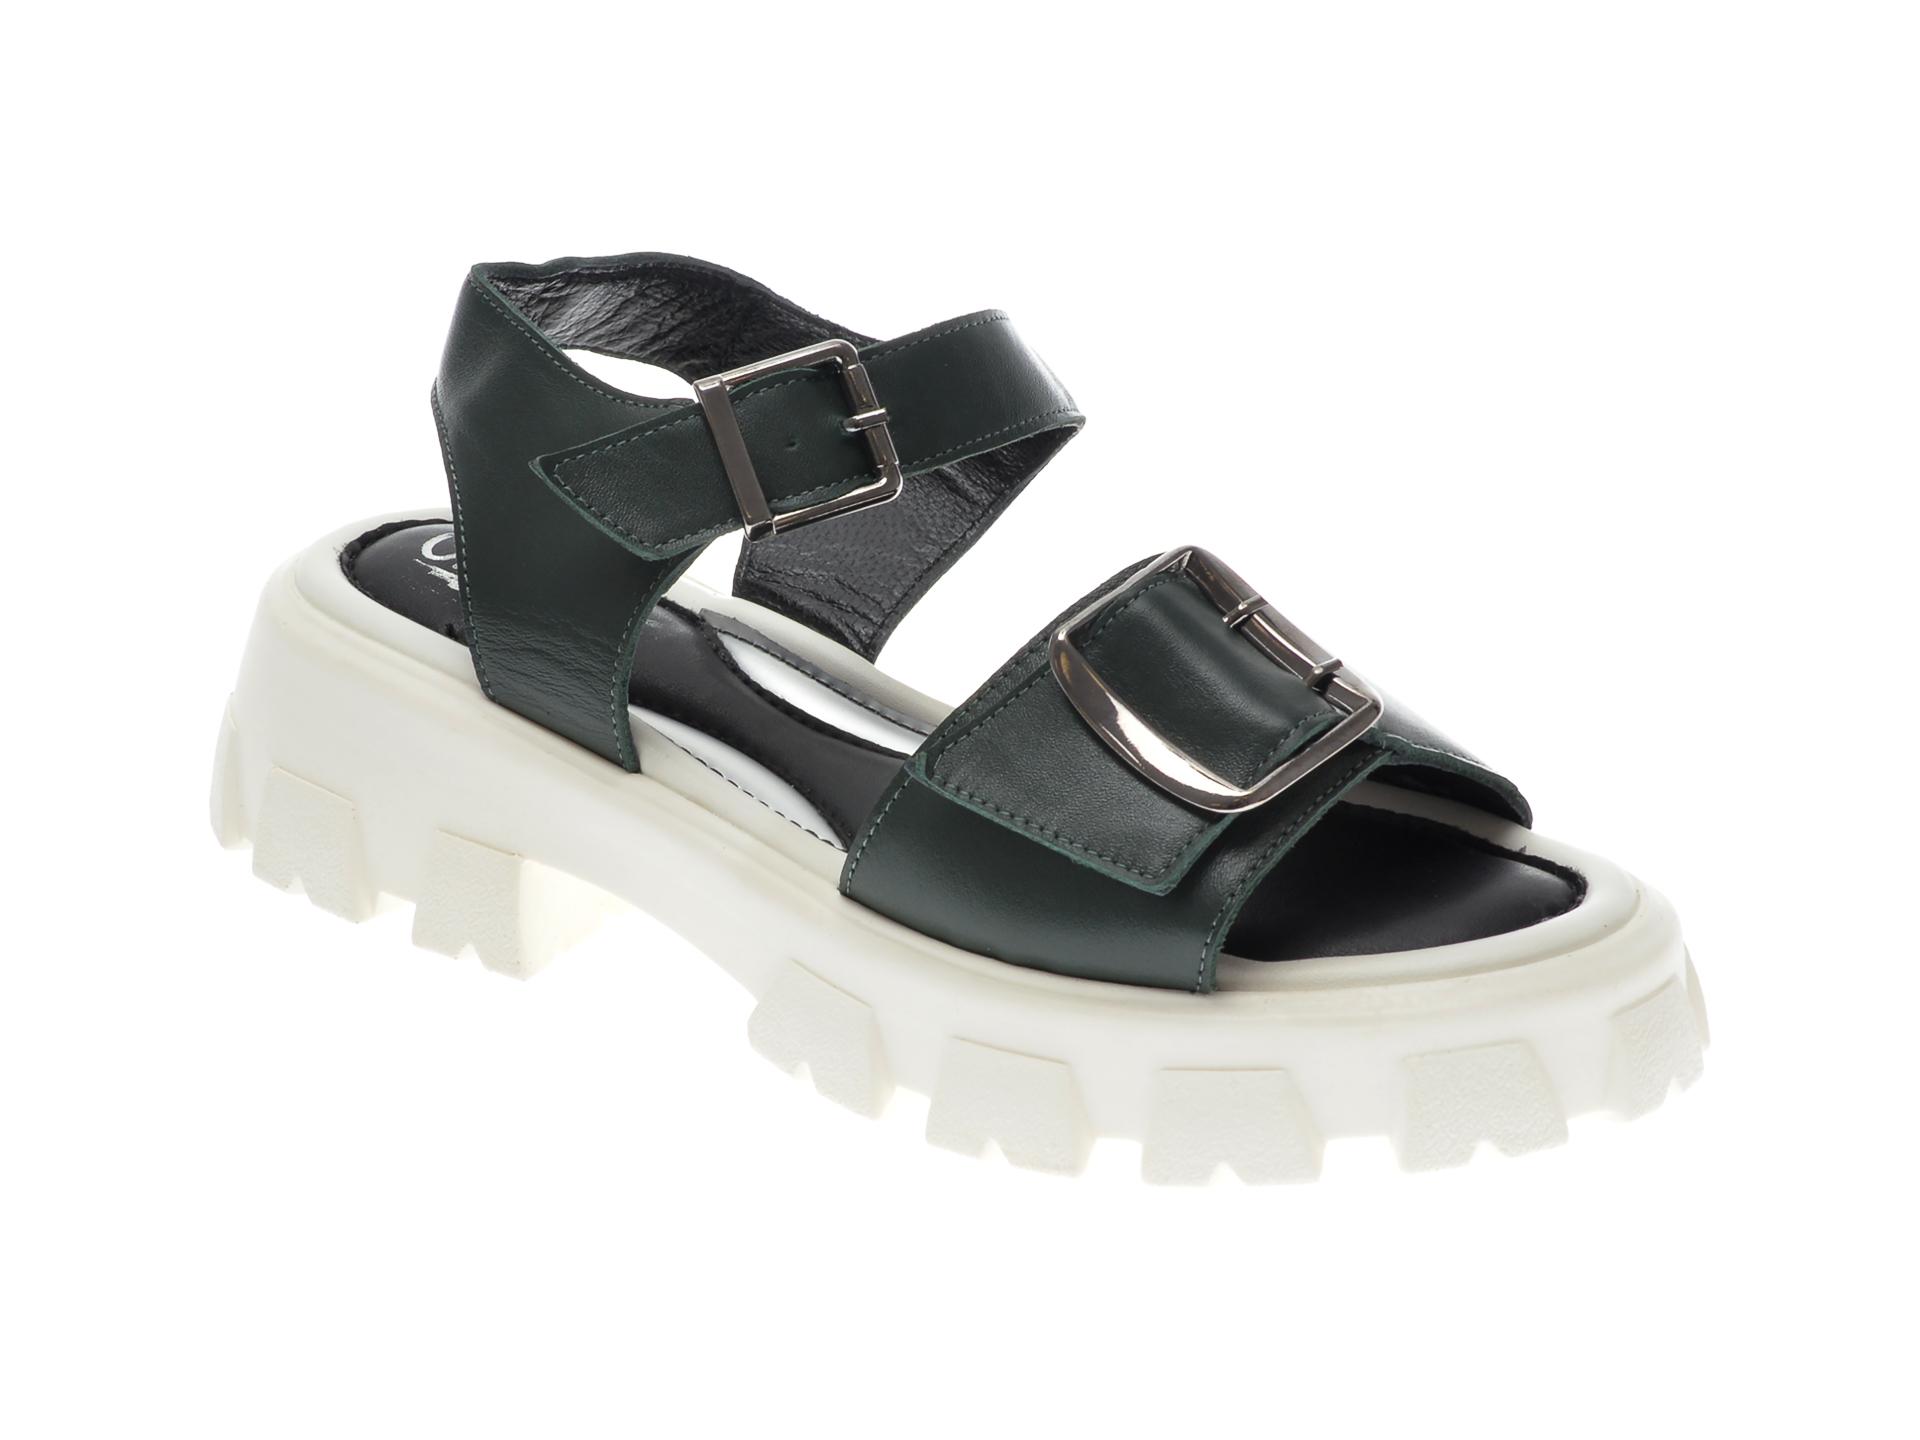 Sandale UNICA verzi, 124, din piele naturala imagine otter.ro